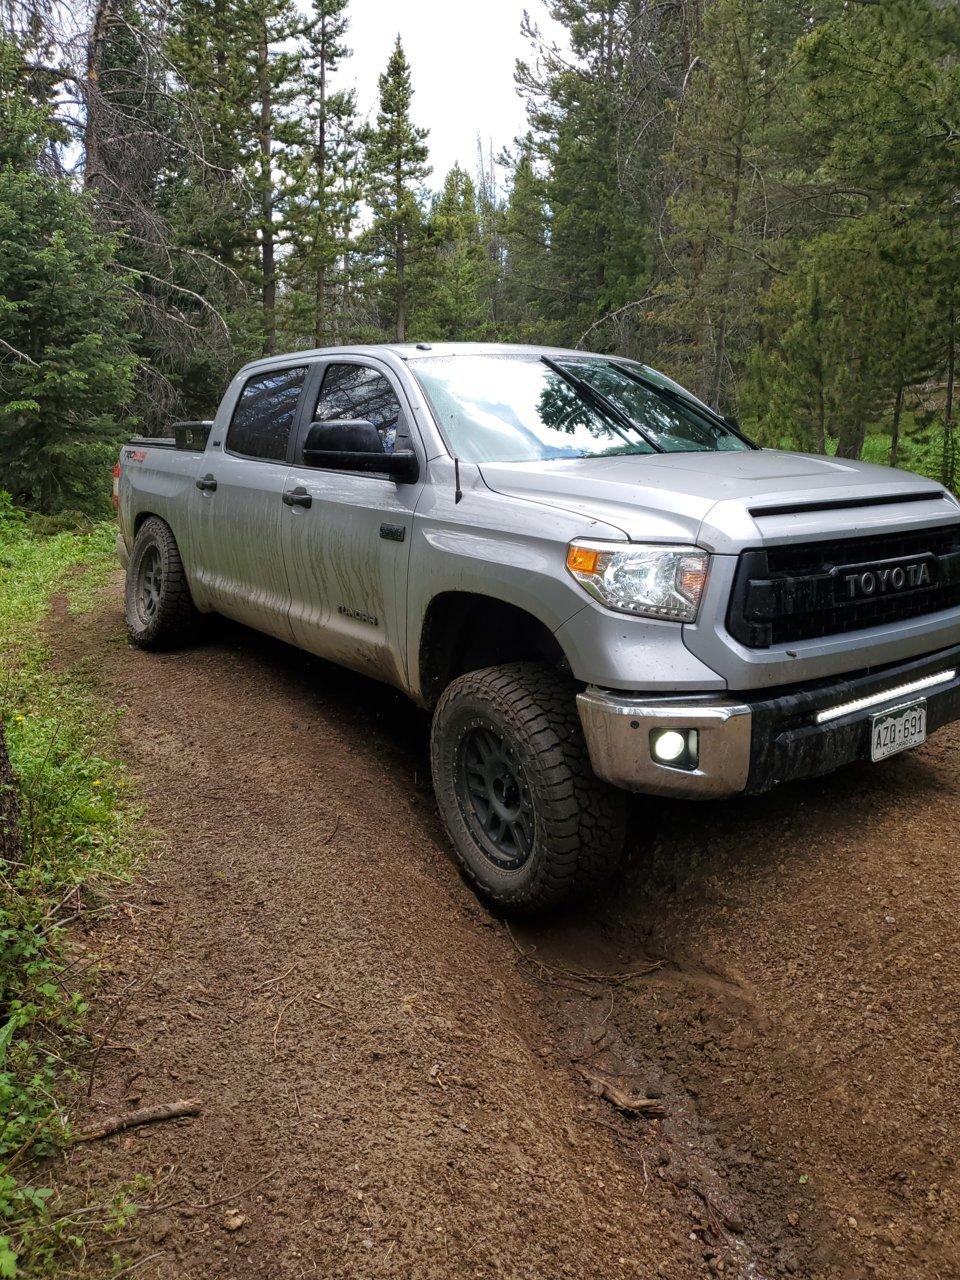 Toyota Tundra 2 5'' Shocks from Elka Suspension | Toyota